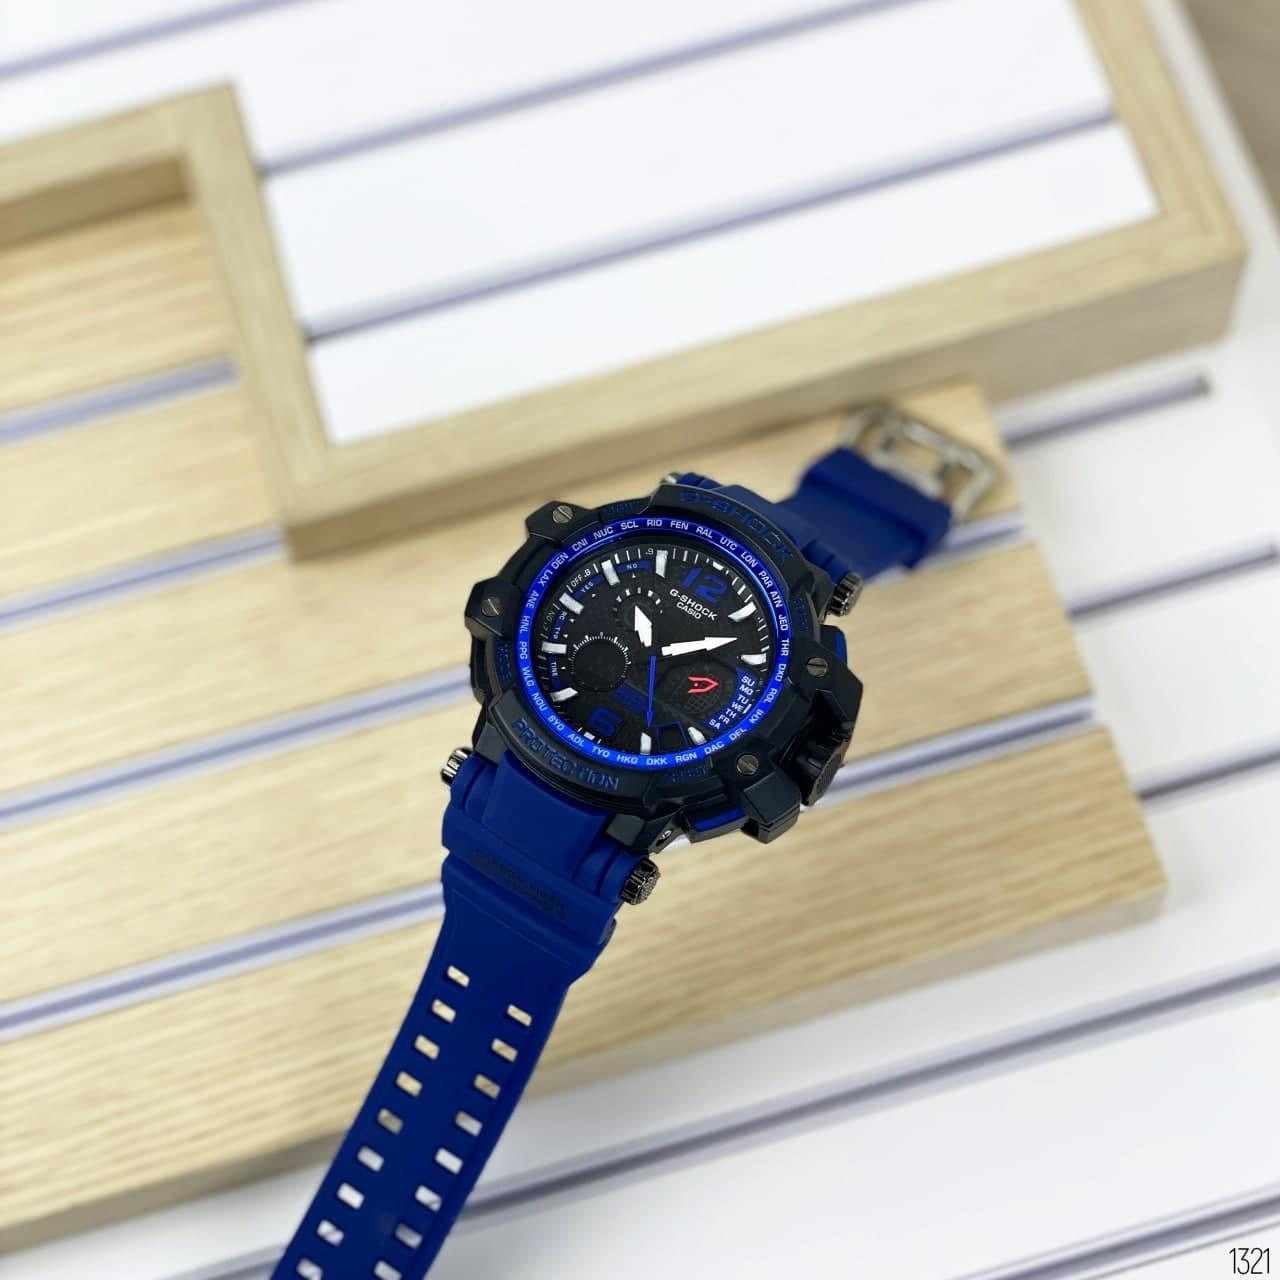 Casio G-Shock GPW-1000 (Black-Blue)